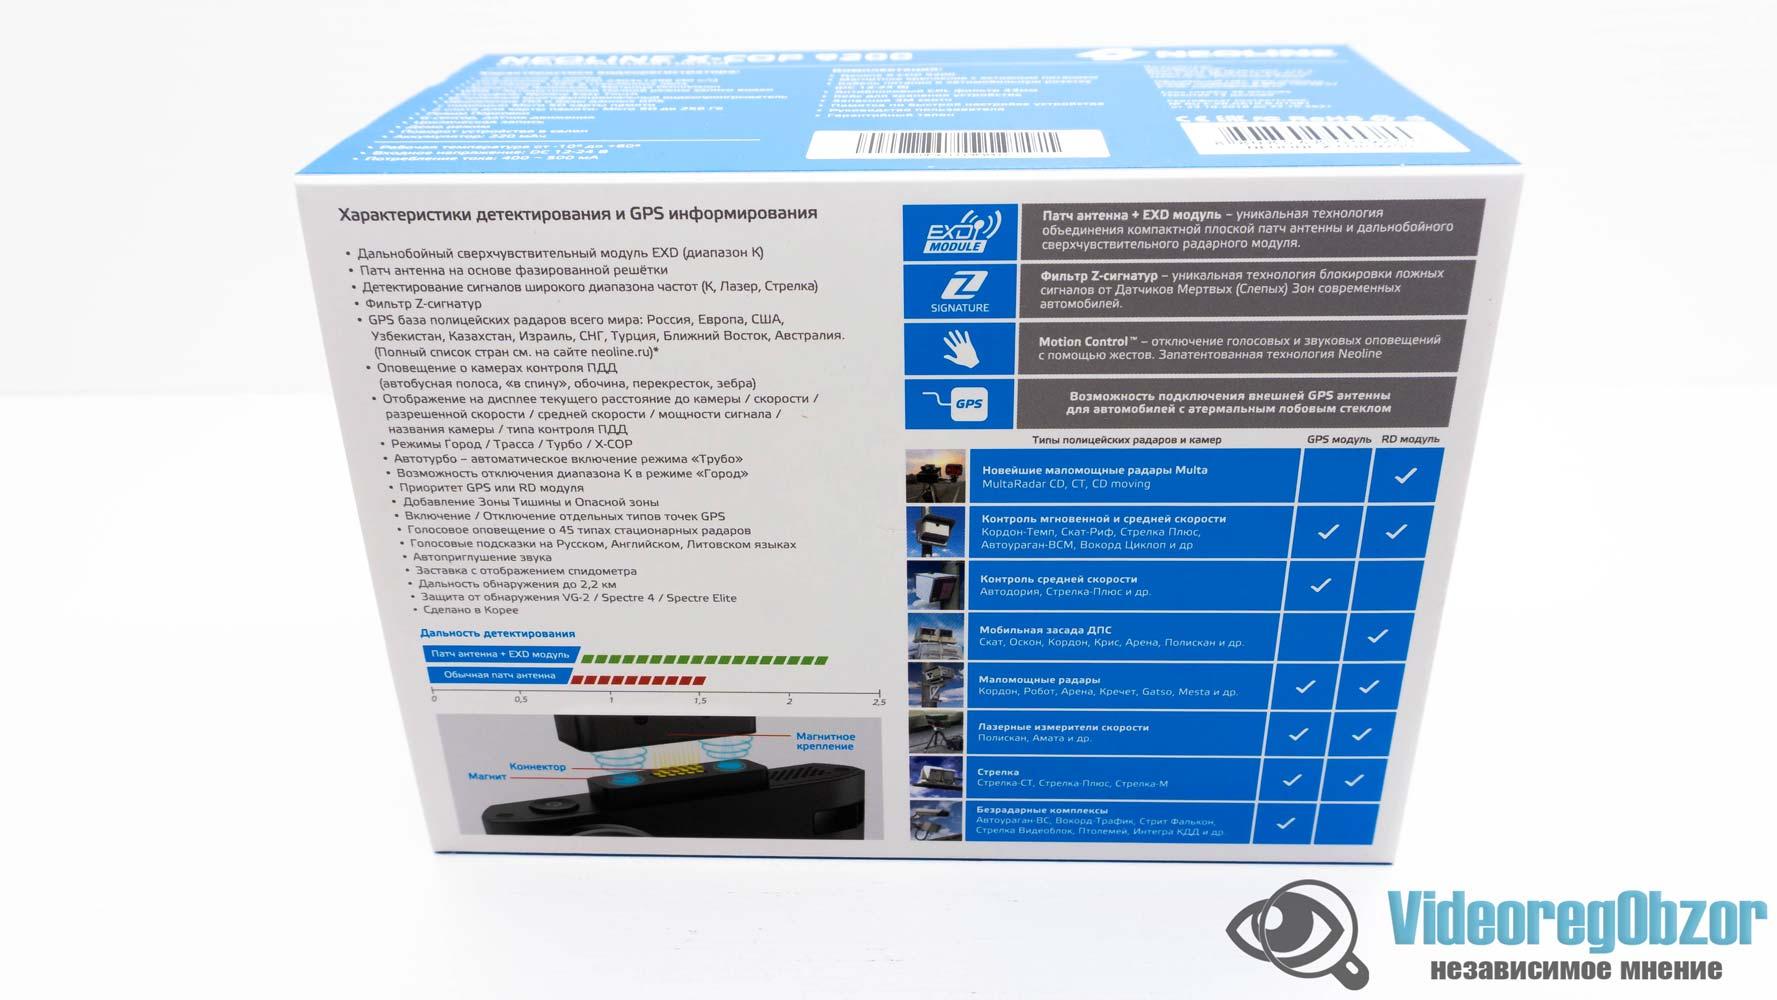 Neoline X COP 9200 обзор 2 VideoregObzor Neoline X-COP 9200: обзор видеорегистратора с радар-детектором